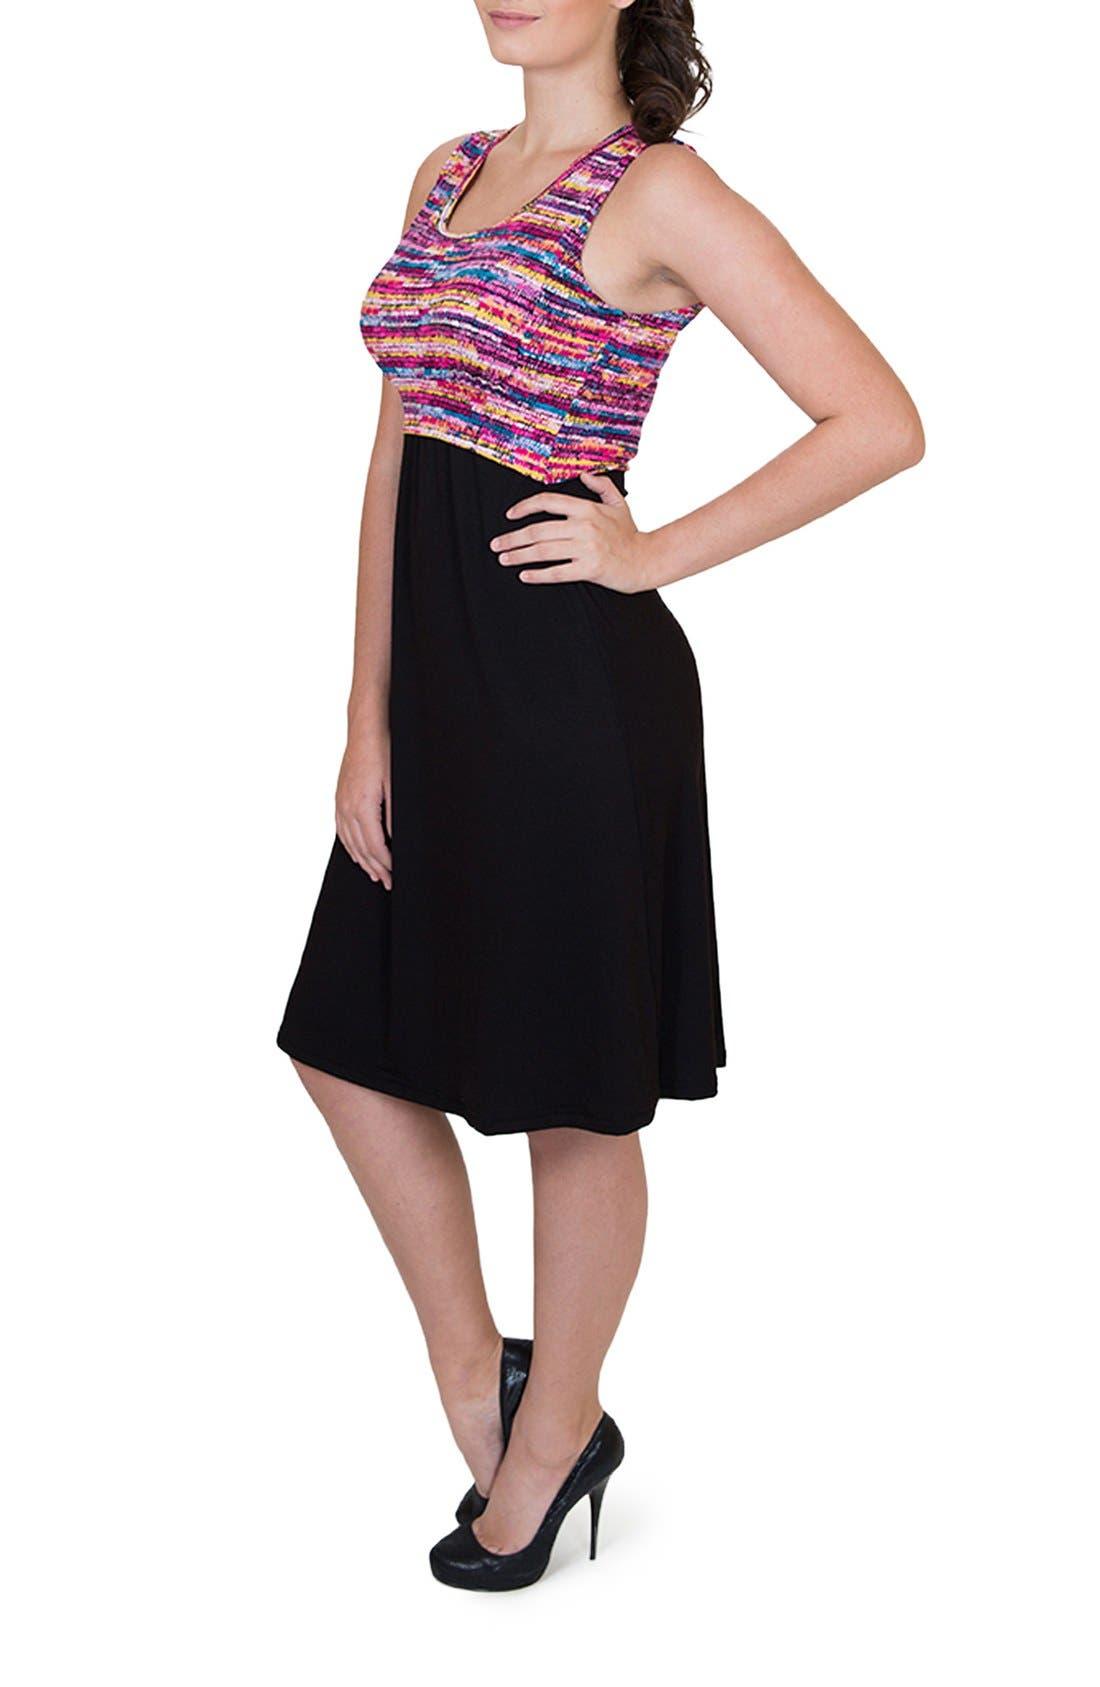 'Ana' Maternity/Nursing Dress,                             Alternate thumbnail 3, color,                             Colorful Top W/ Black Skirt